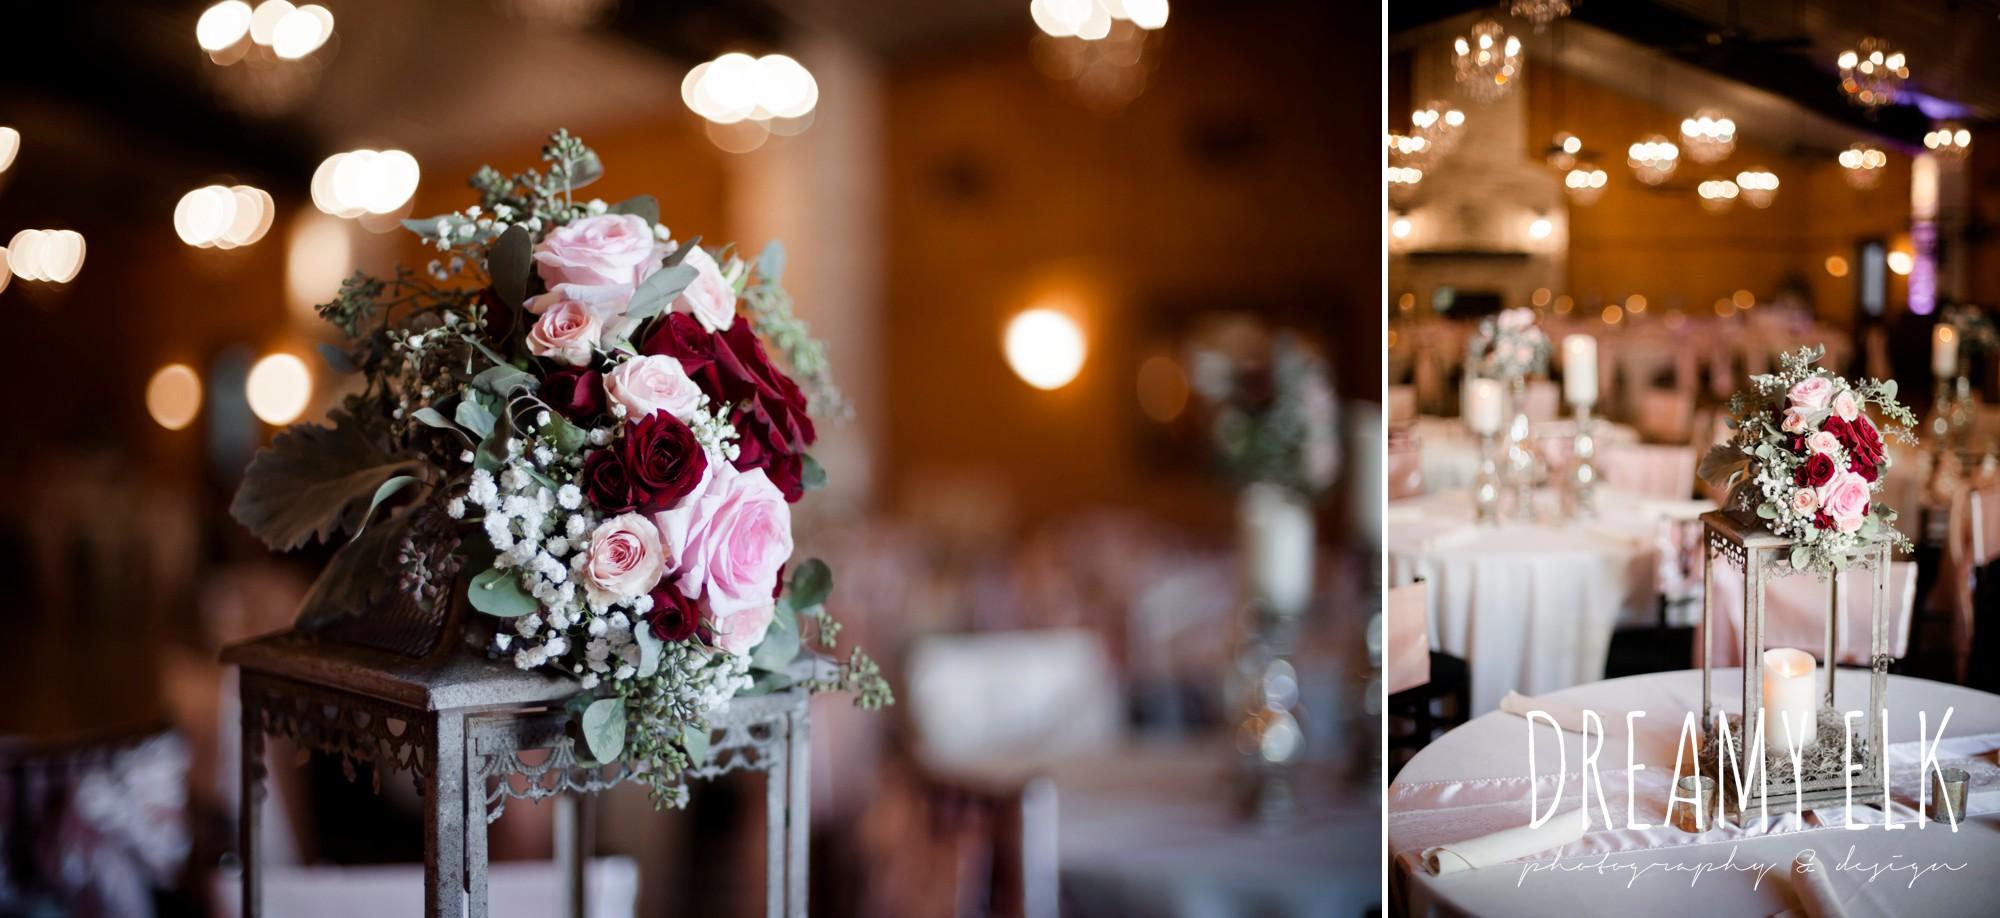 september wedding photo, ashelynn manor, magnolia, texas, austin texas wedding photographer {dreamy elk photography and design}